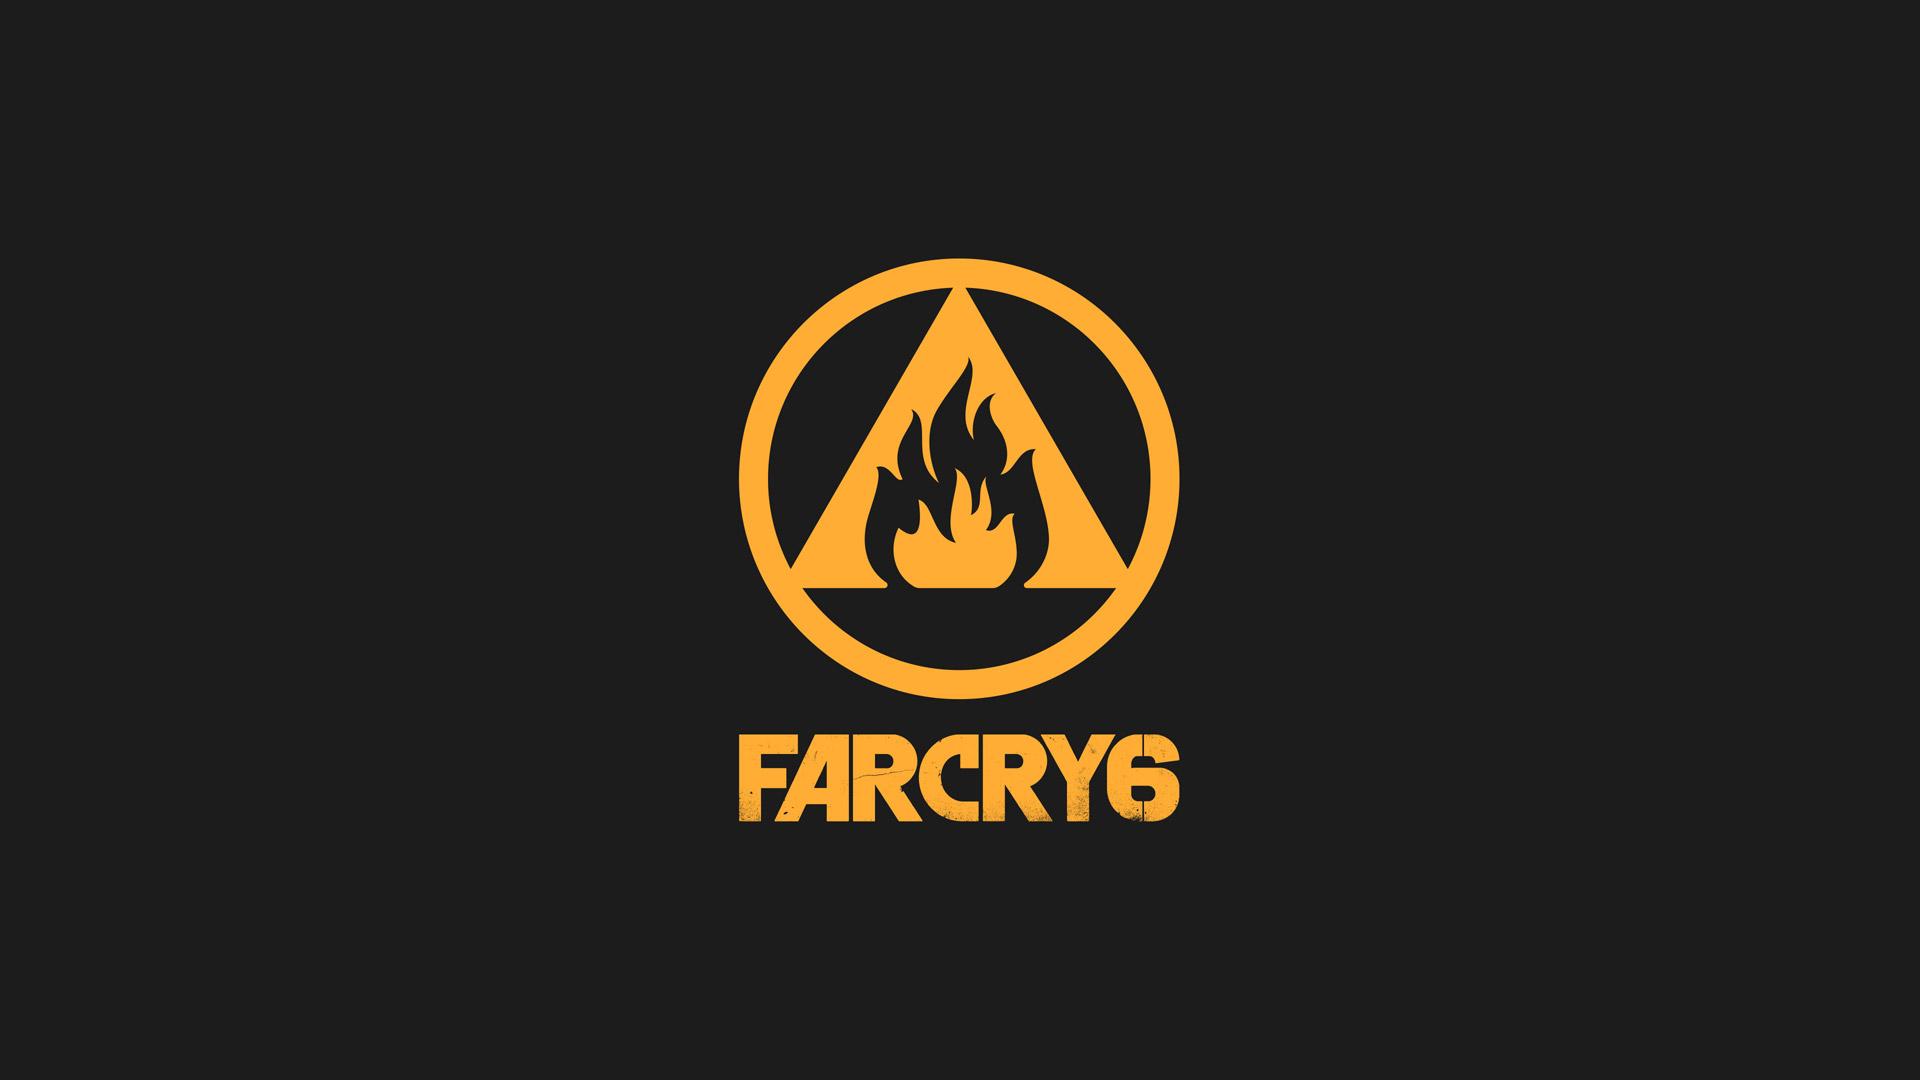 Far Cry 6 Wallpaper in 1920x1080